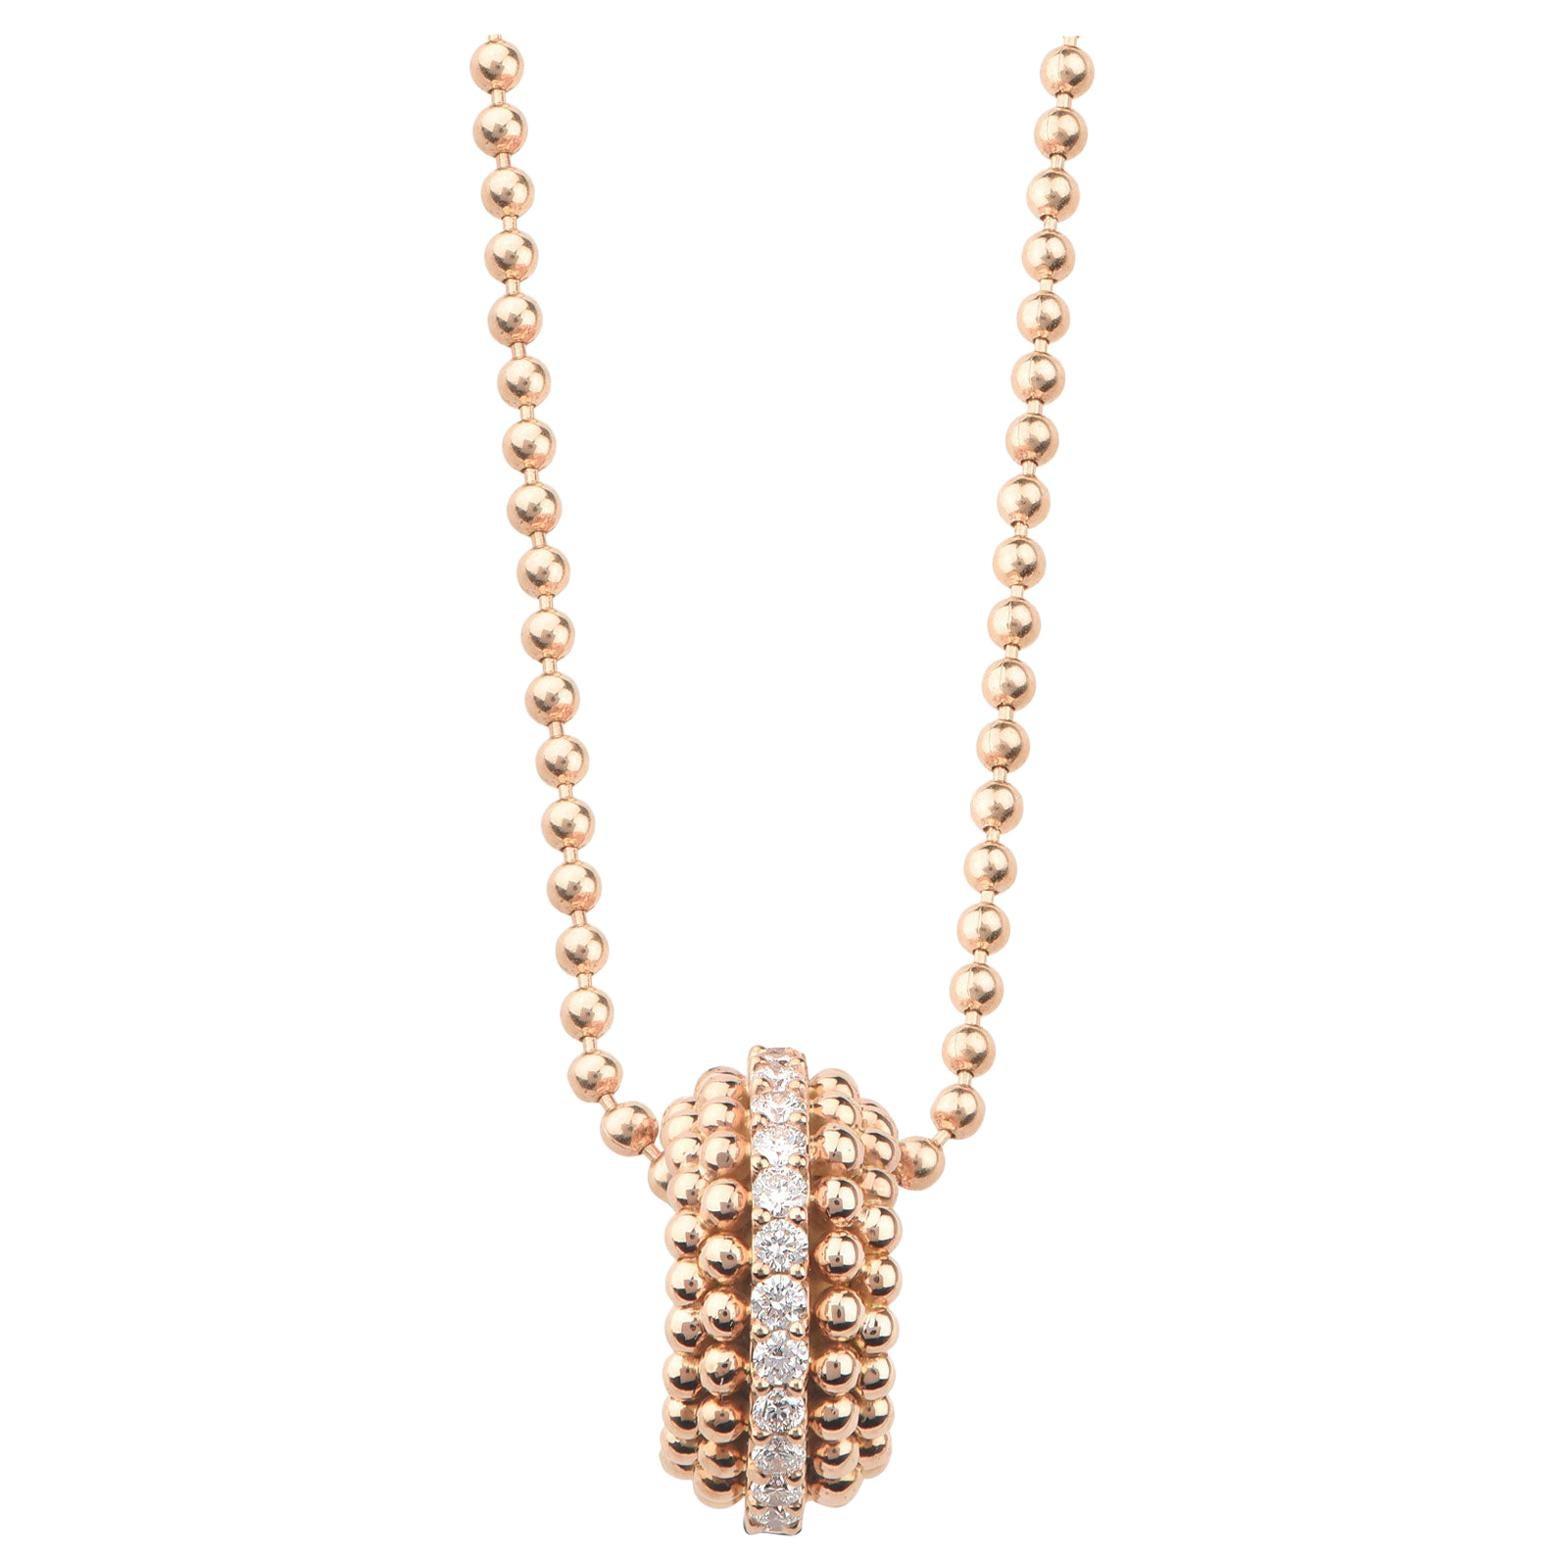 Harakh 0.16 Carat Colorless Diamond 18 Karat Rose Gold Sunlight Pendant Necklace